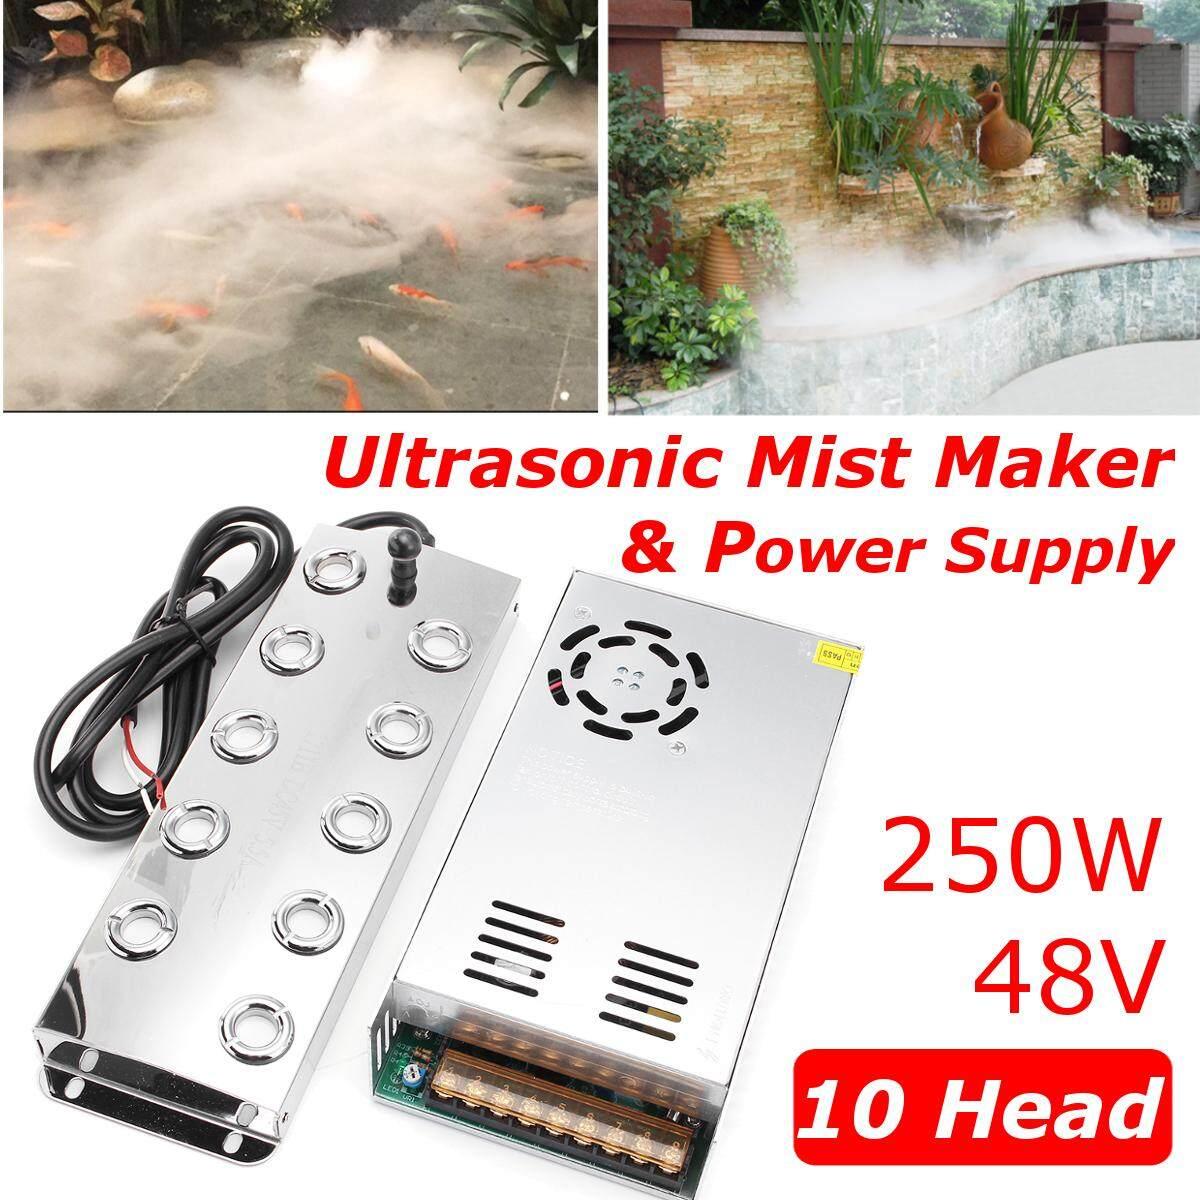 10 Head Ultrasonic Mist Maker Industry Fogger Humidifier 250w + Power Supply By Warmroom.